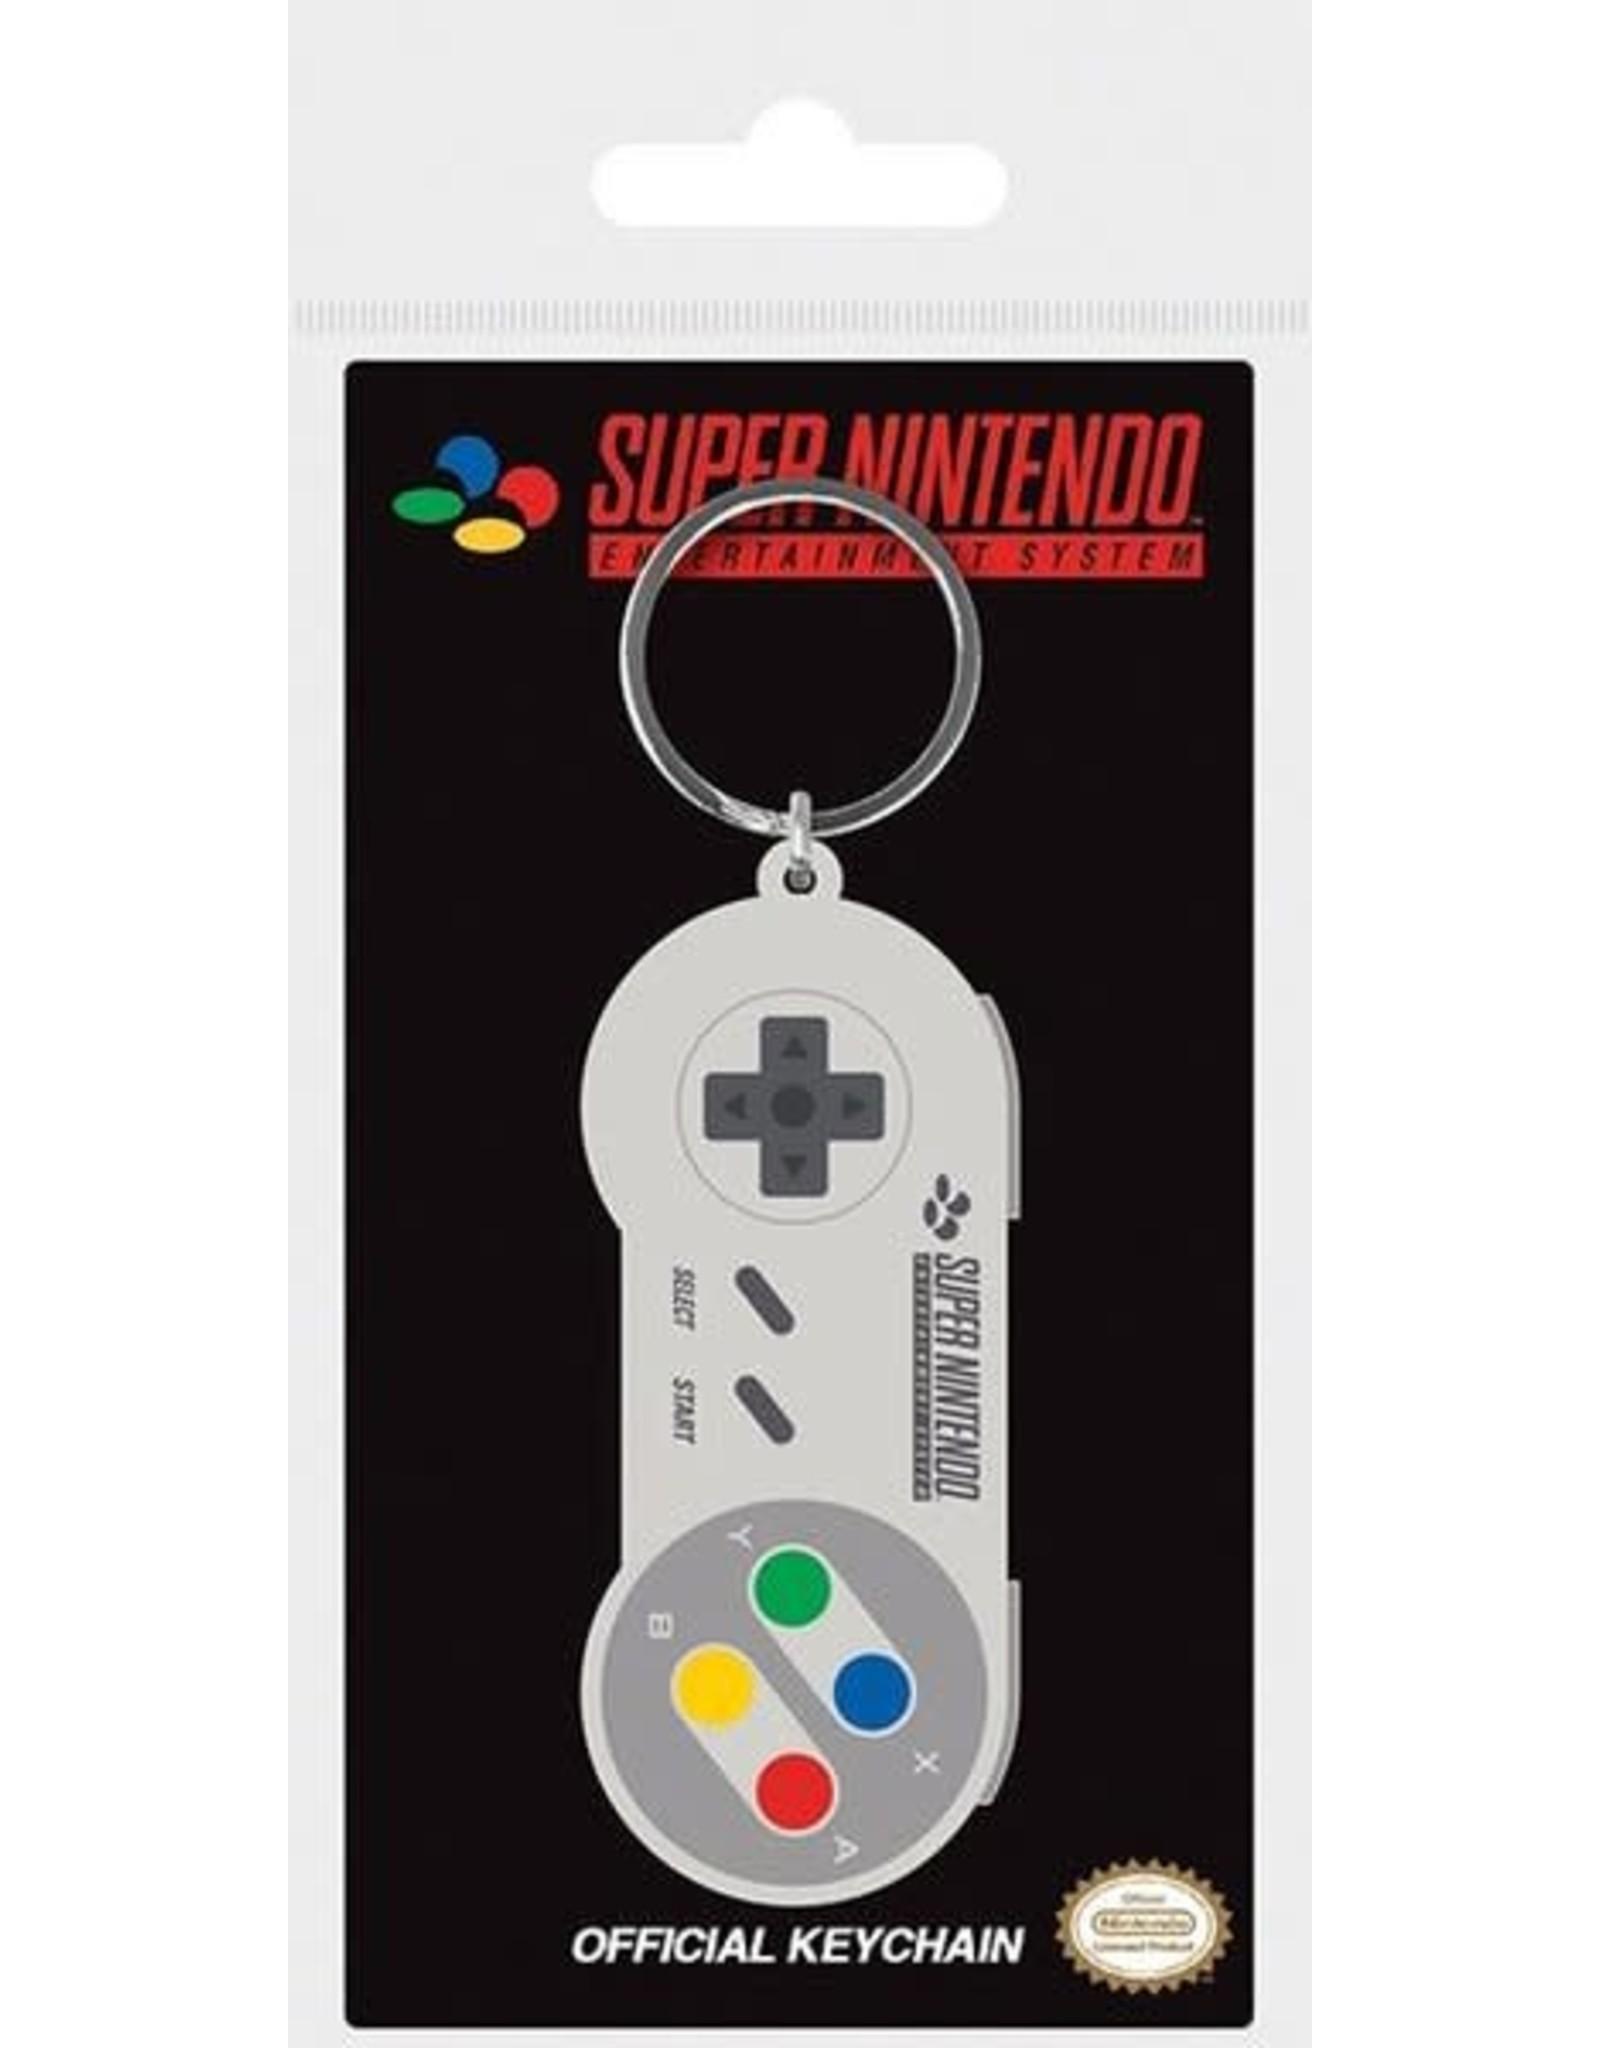 Nintendo - SNES controller - Keychain